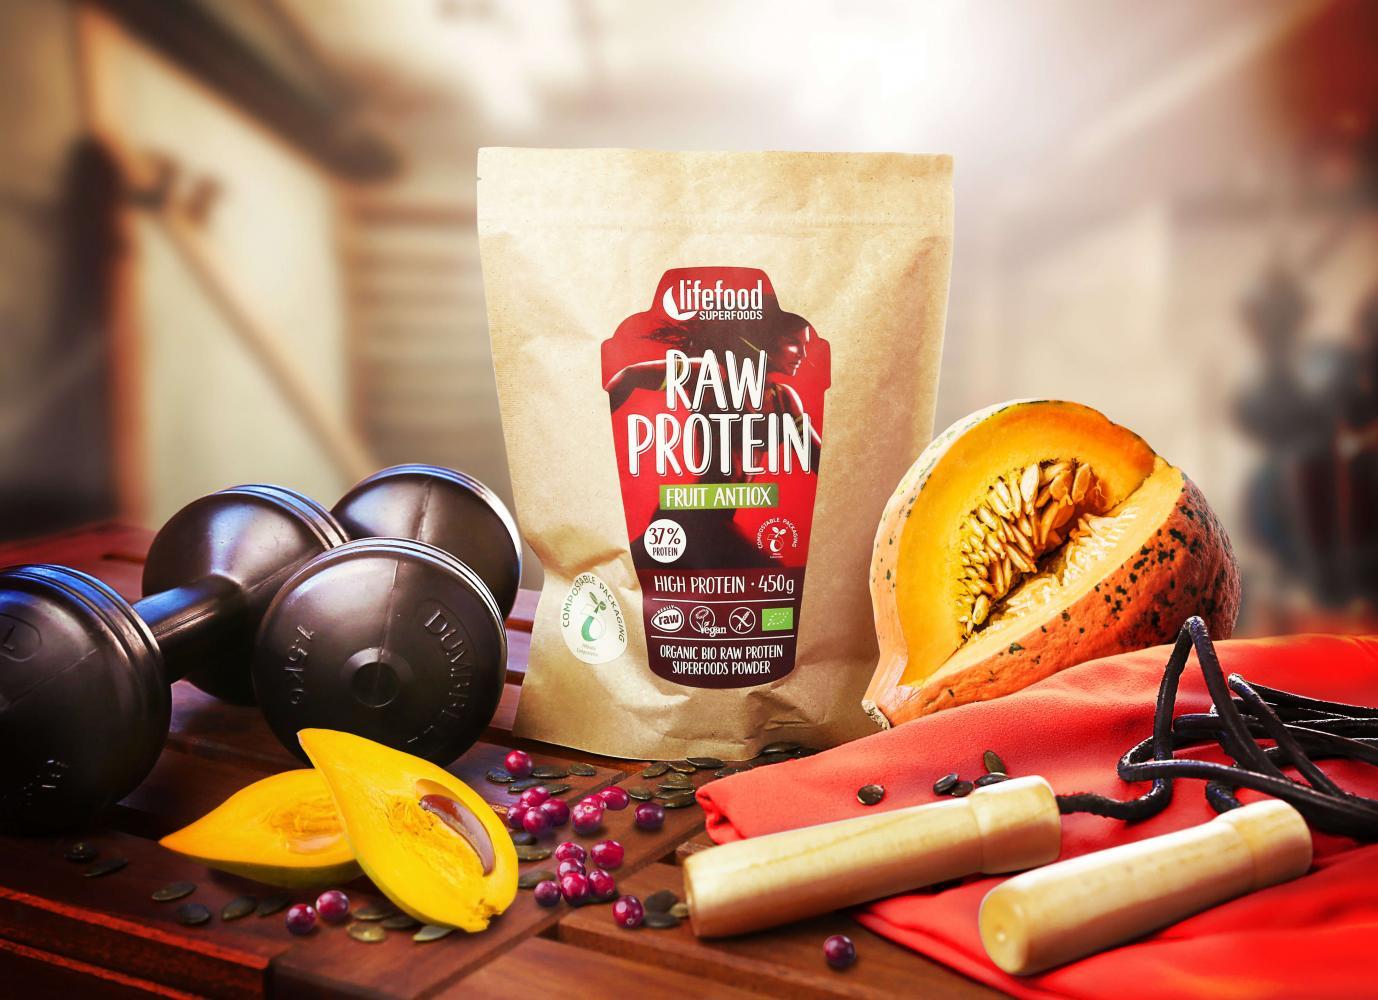 Raw veganské proteiny se superfoods od Lifefoodu